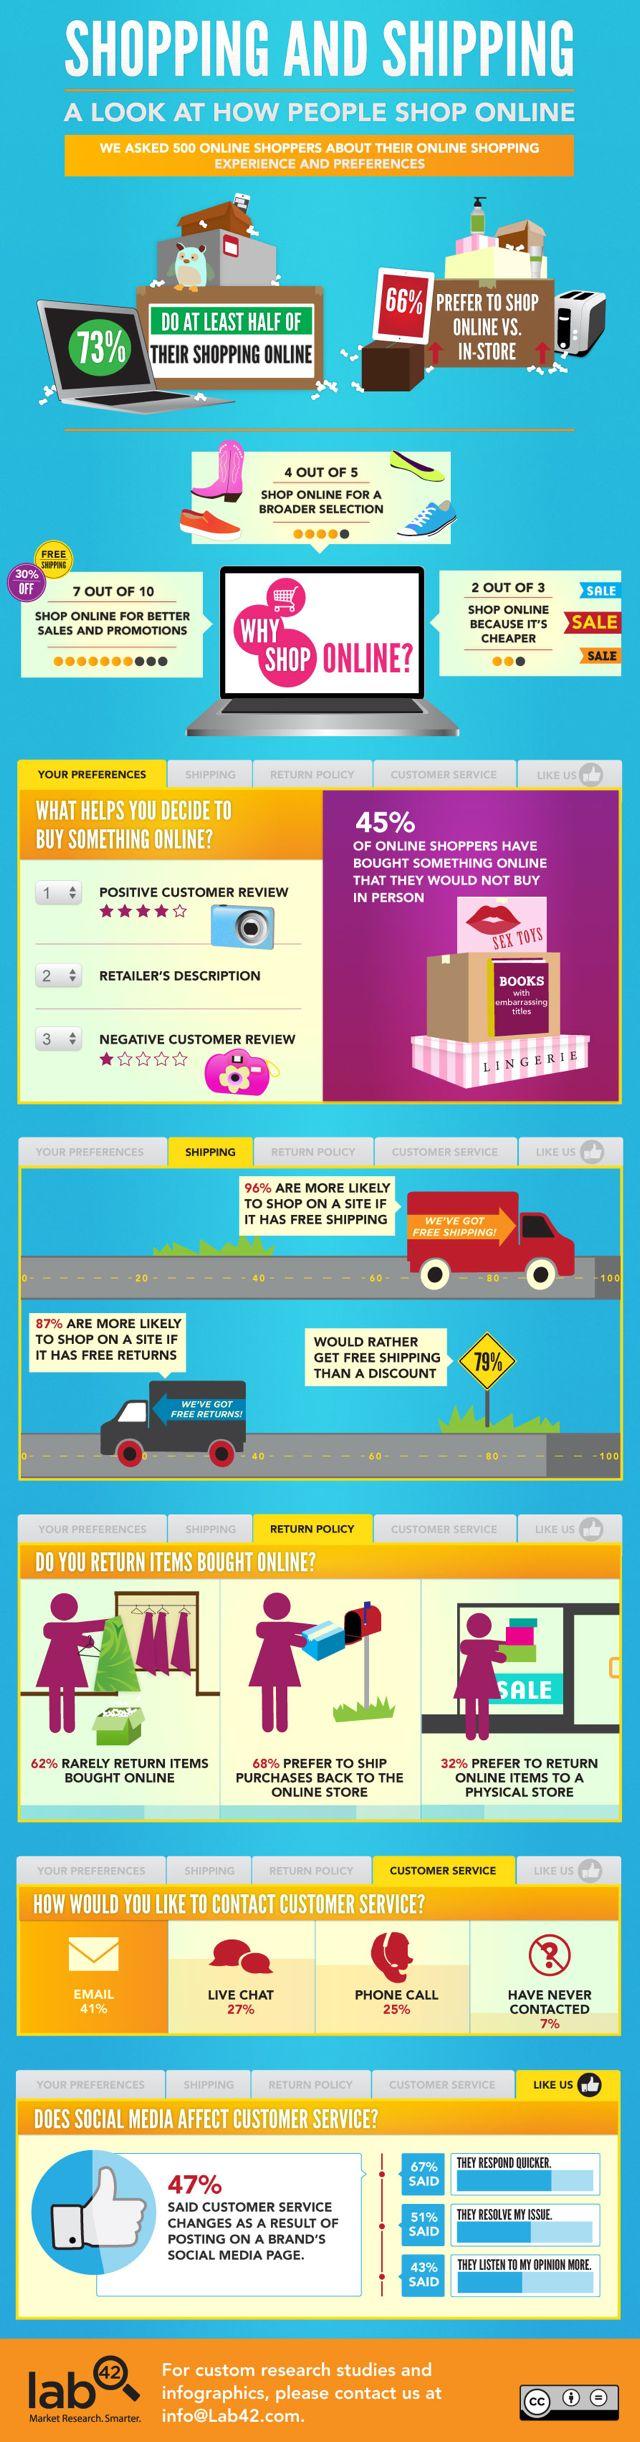 typical online-shopper